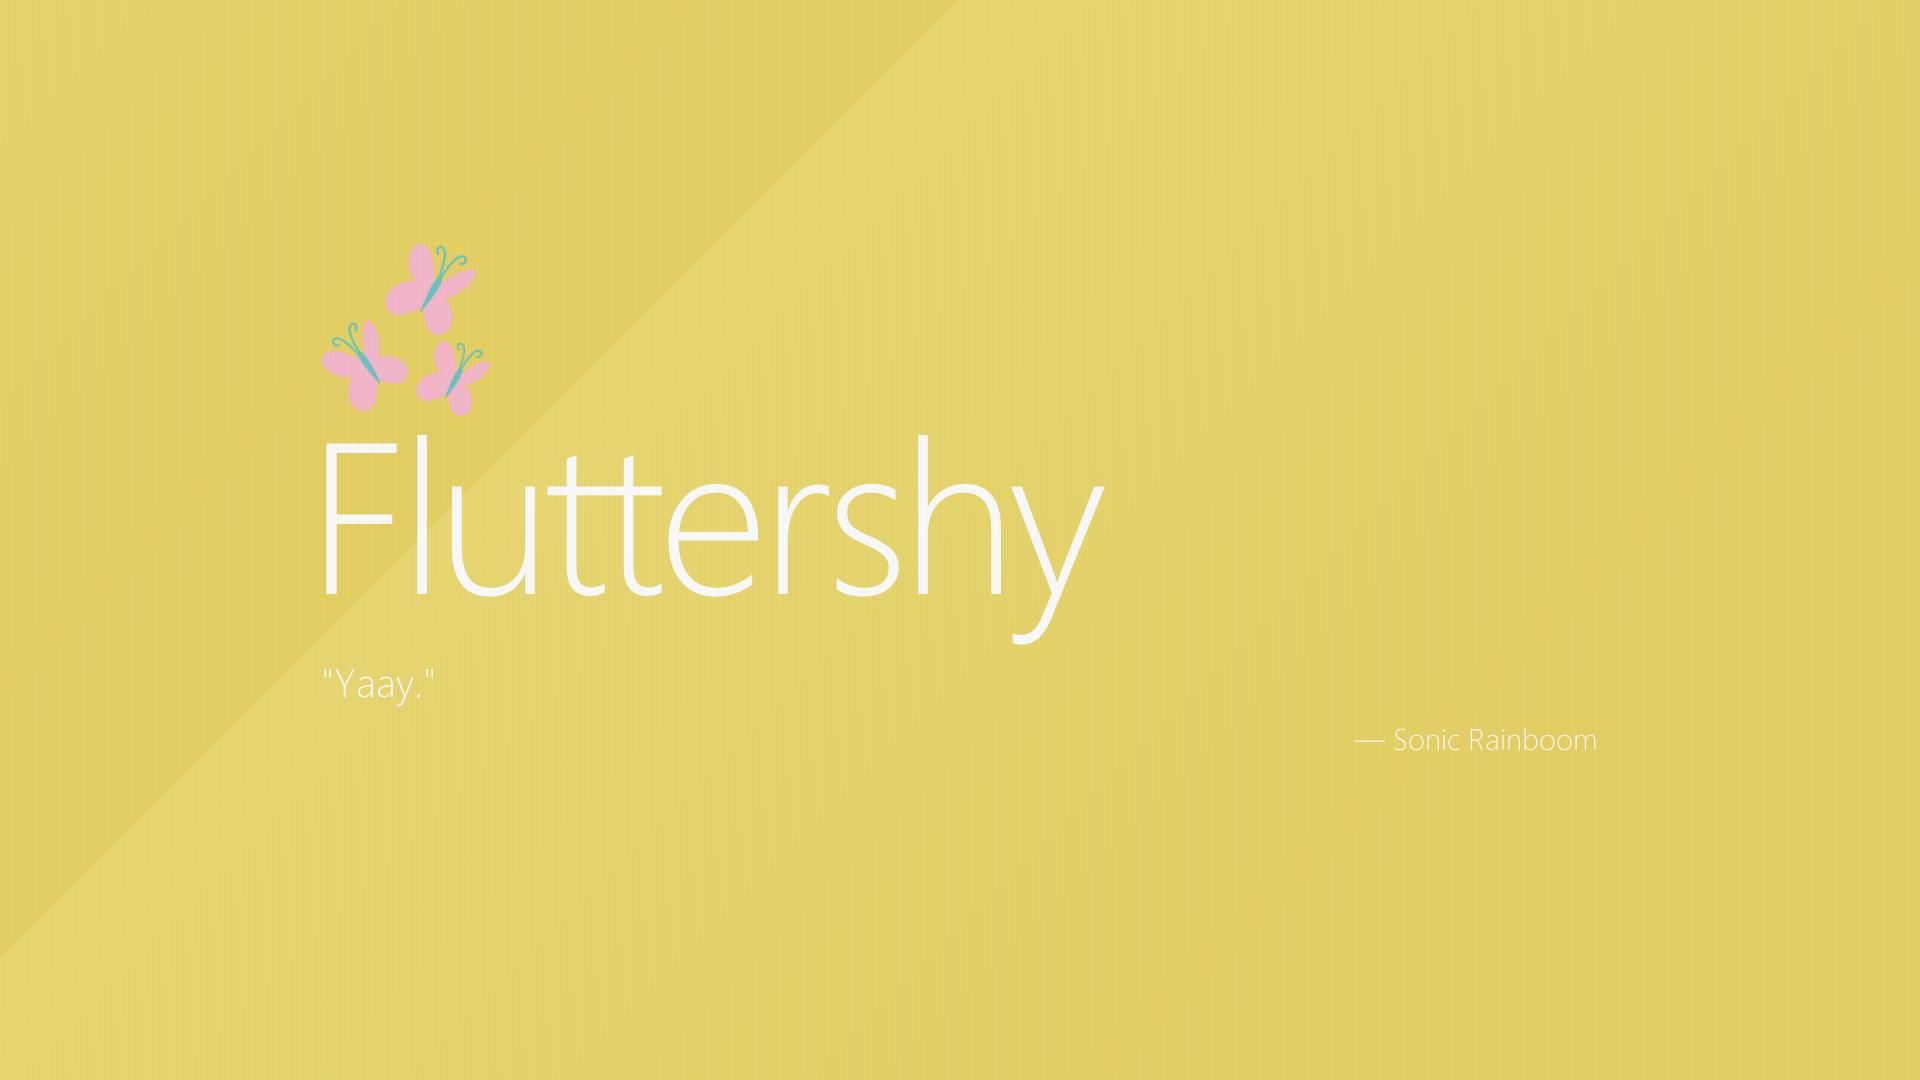 fluttershy windows wallpaper - photo #10